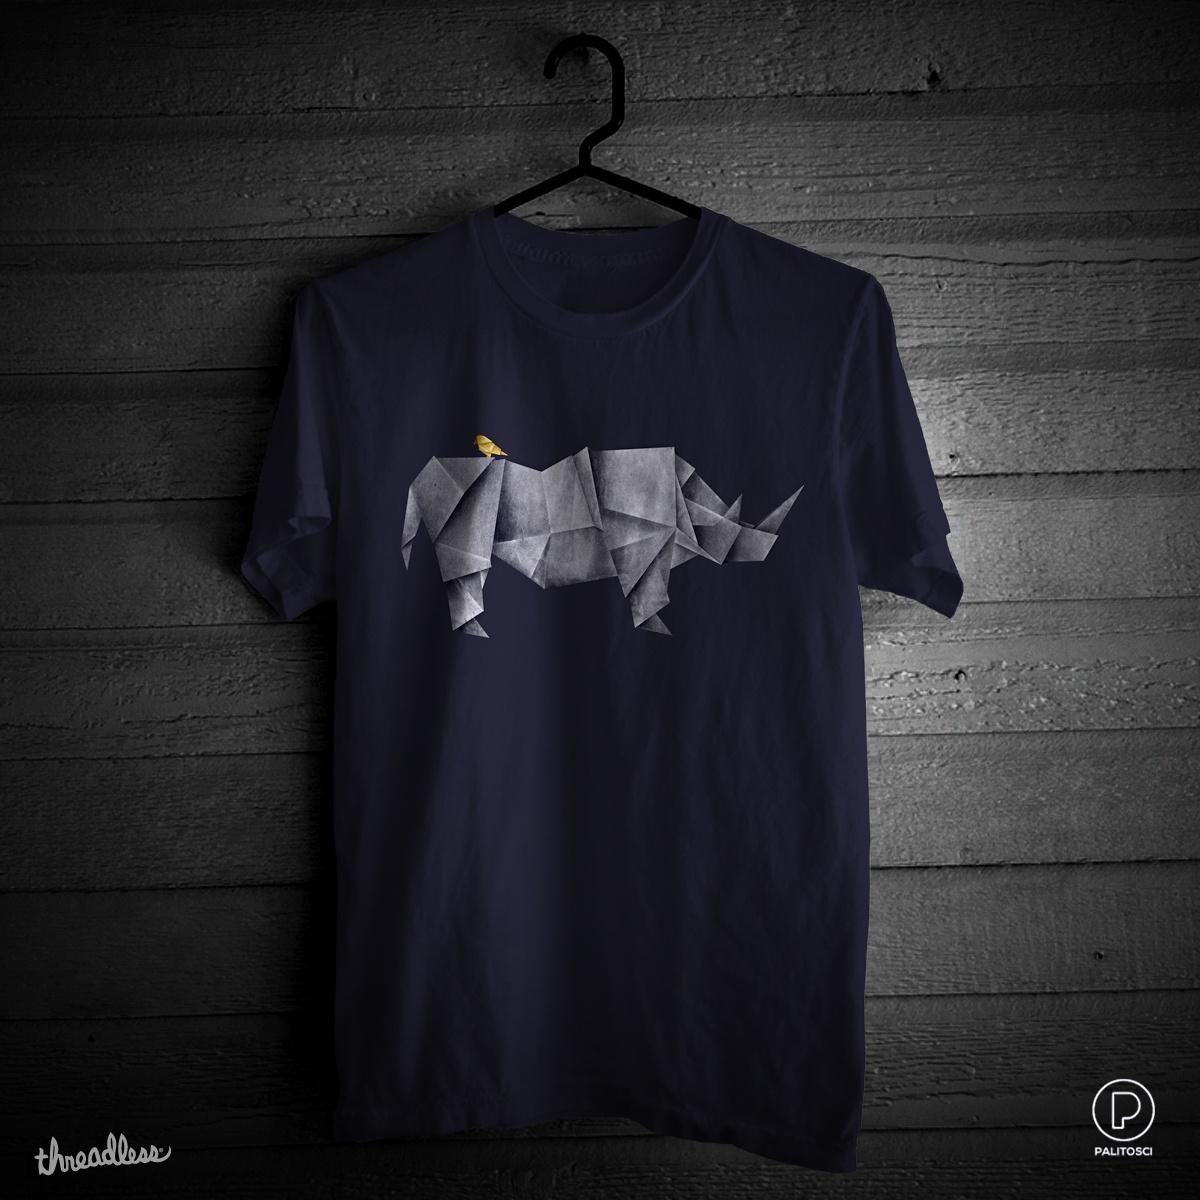 Rhinogami by palitosci on Threadless